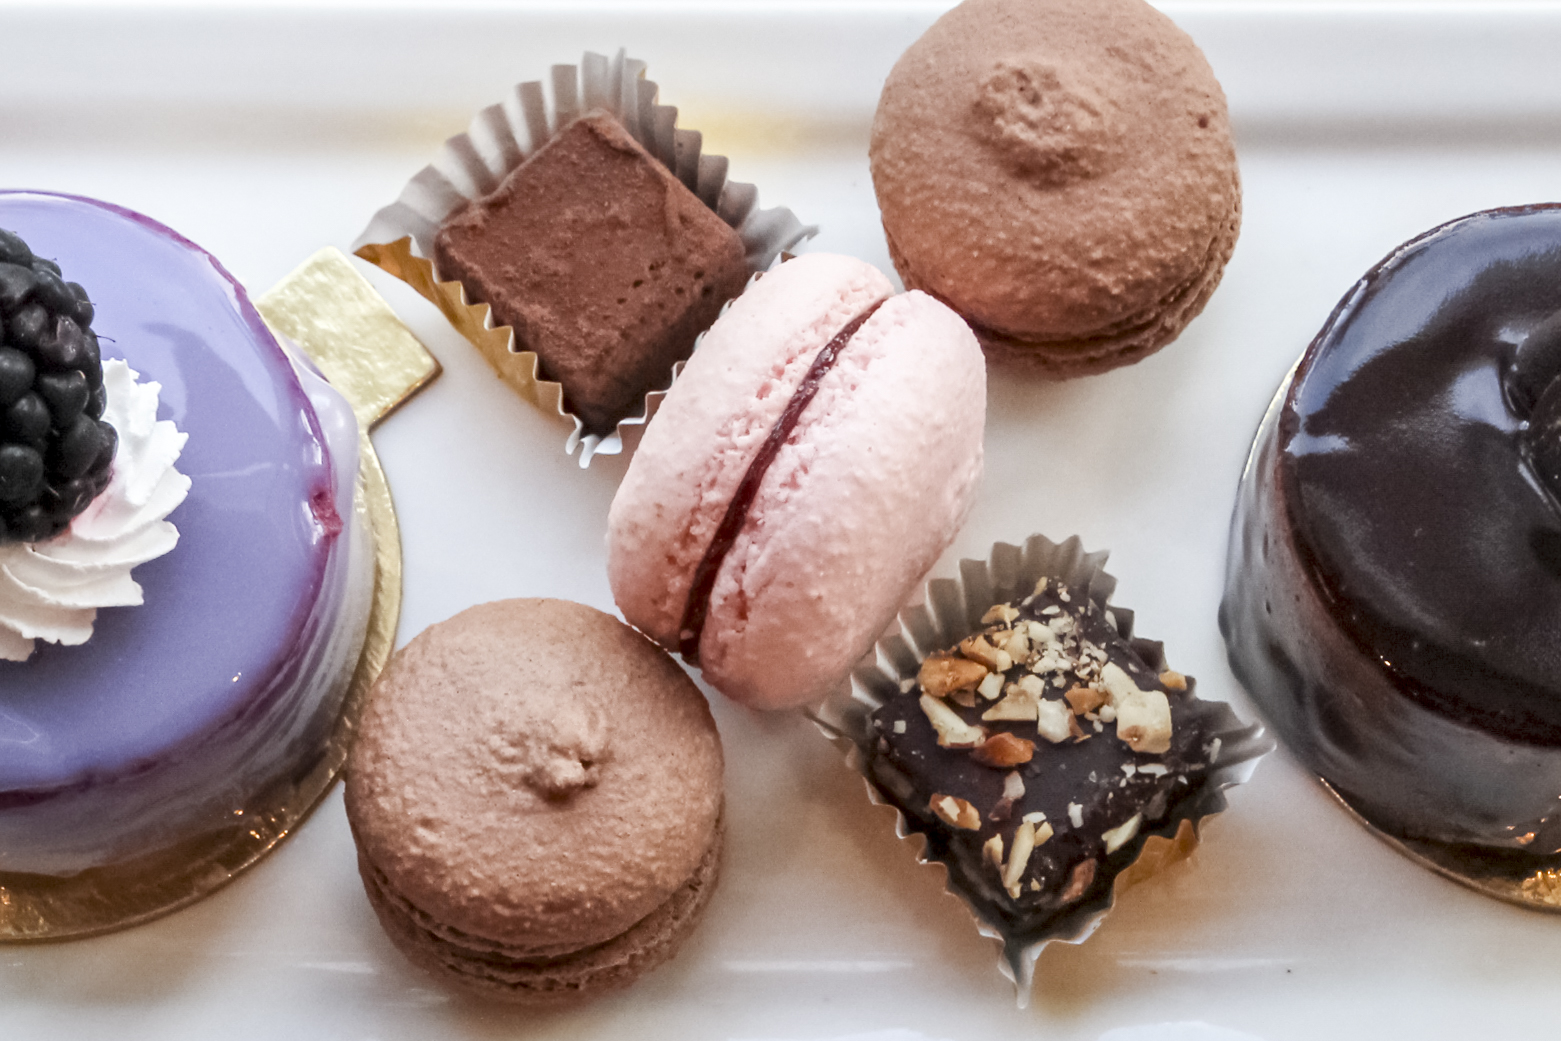 Chocolate Truffle, Amaretto Truffle, Chocolate Macarons and Raspberry Macaron